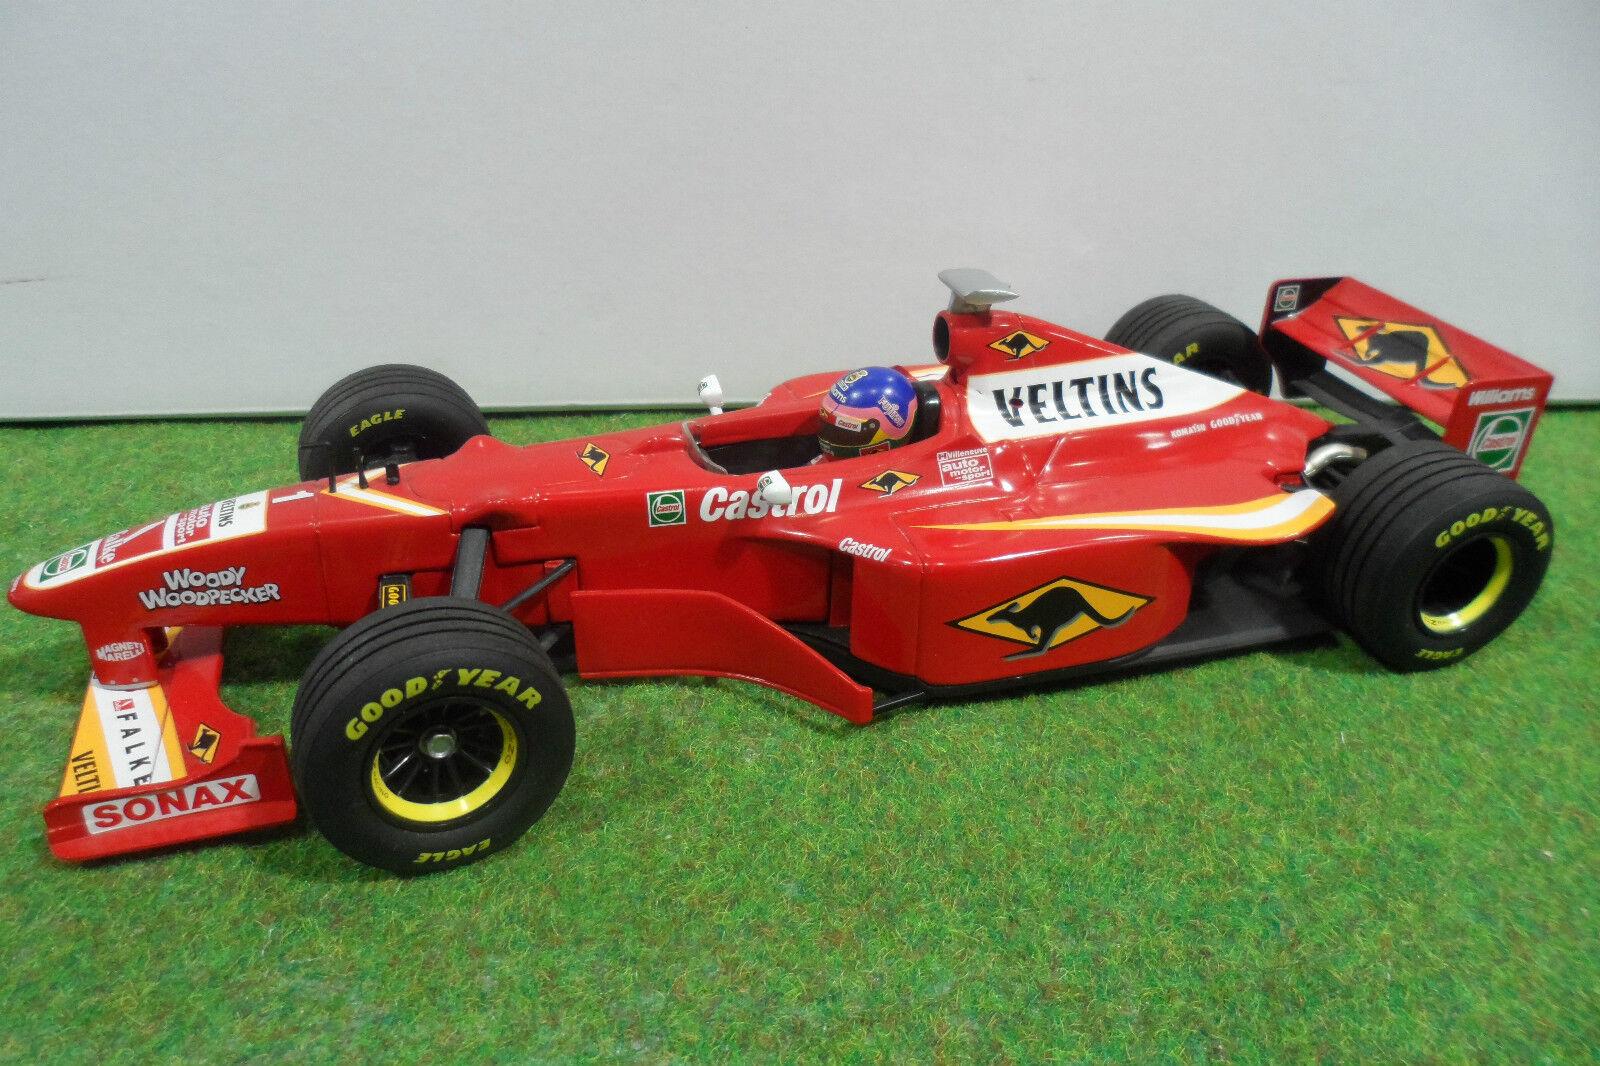 F1 WILLIAMS FW20  1 MECACHROME 1998 VELTINS au 1 18 MINICHAMPS voiture miniature